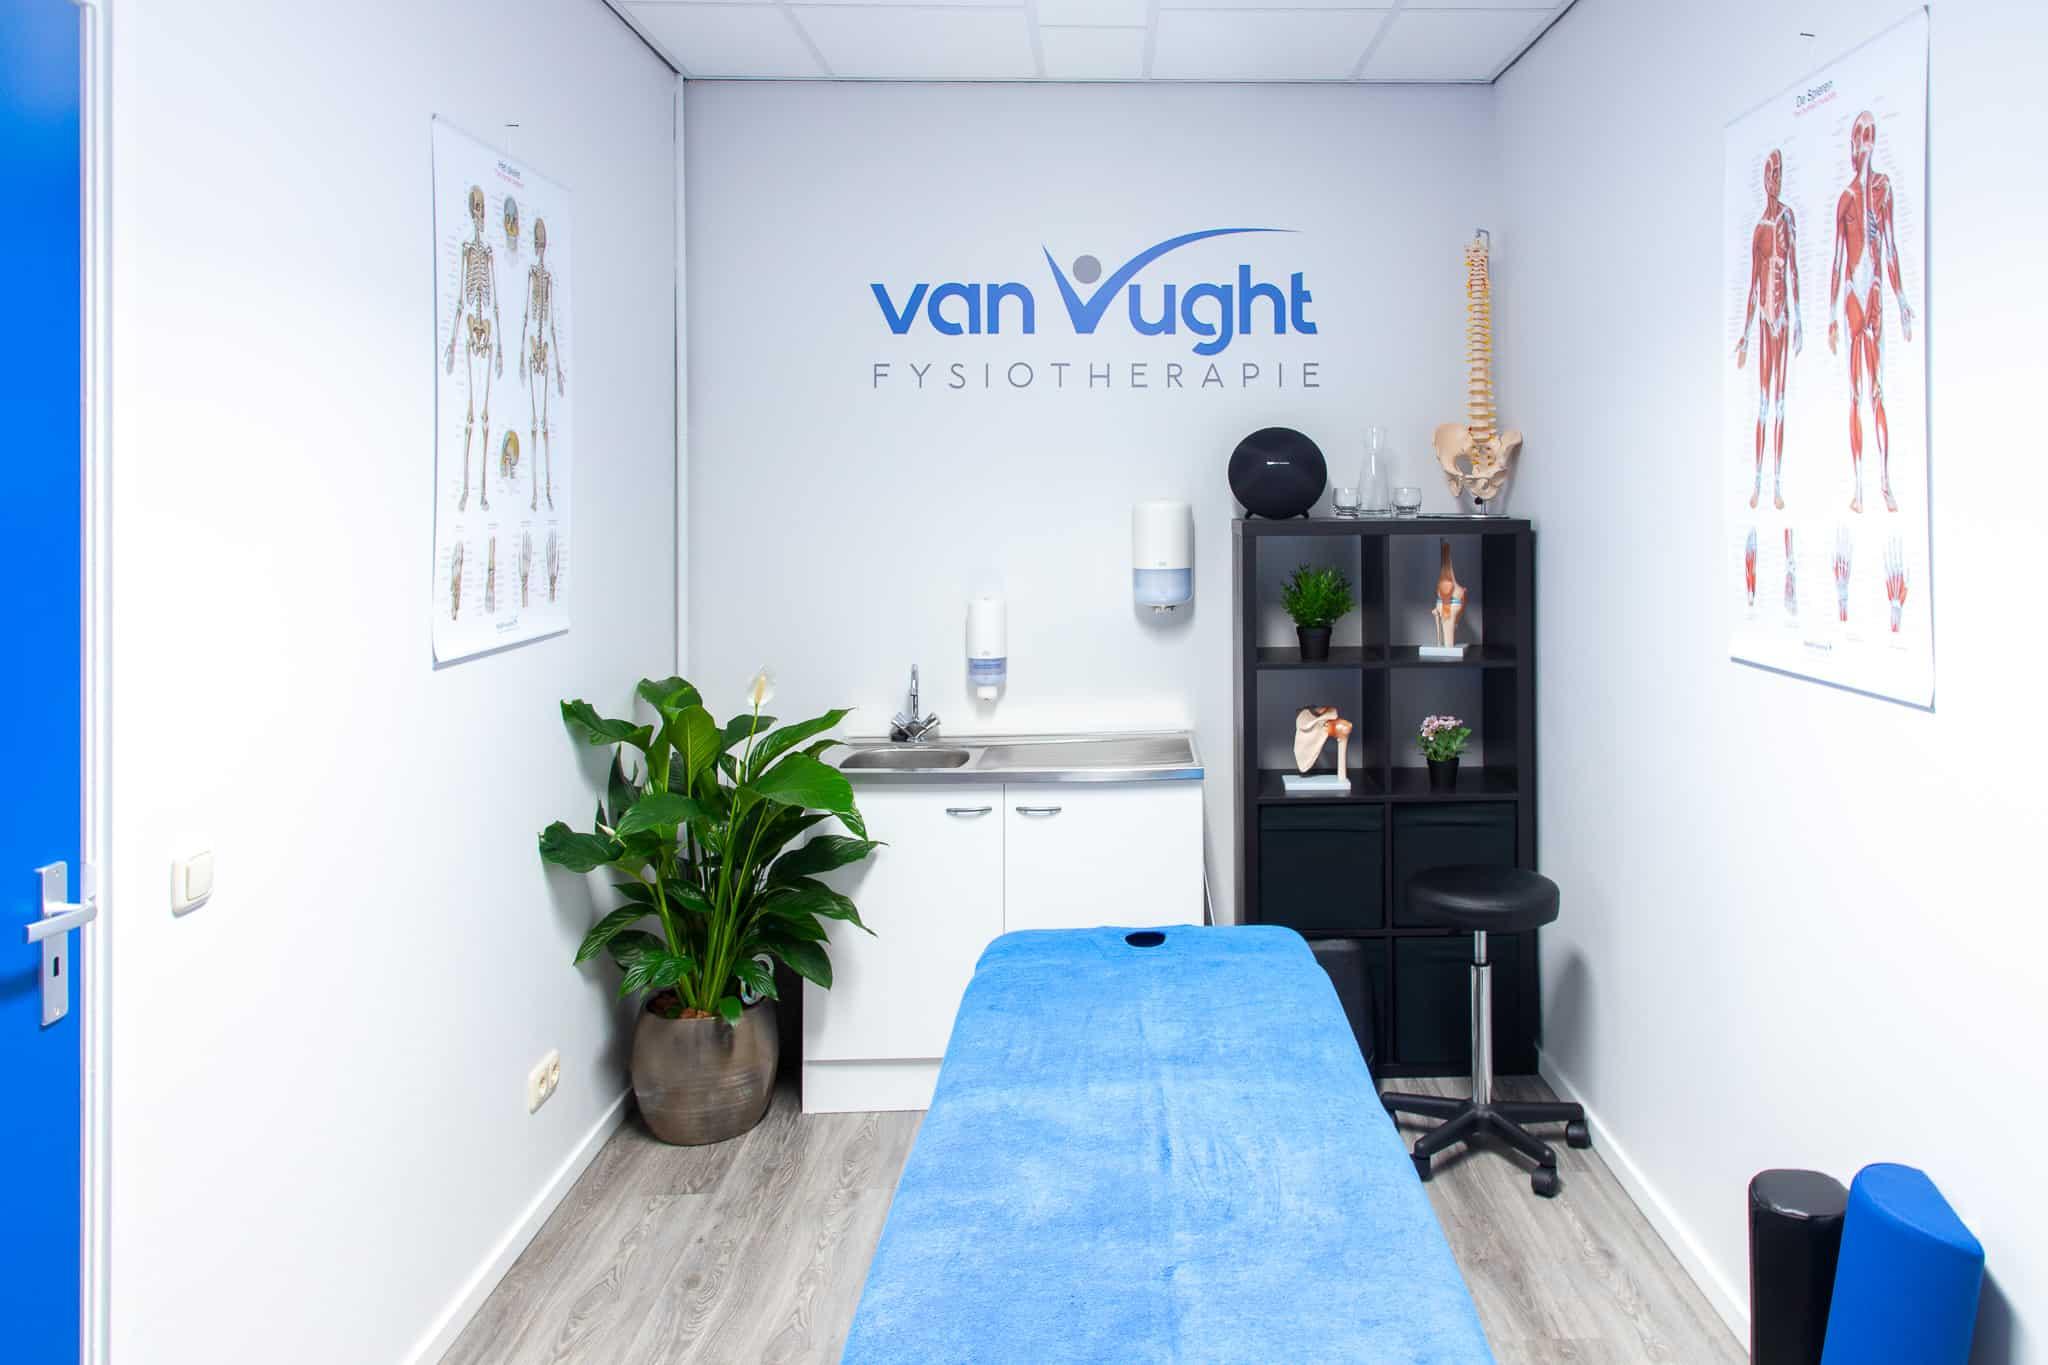 oefentherapie-van-vught-fysiotherapie